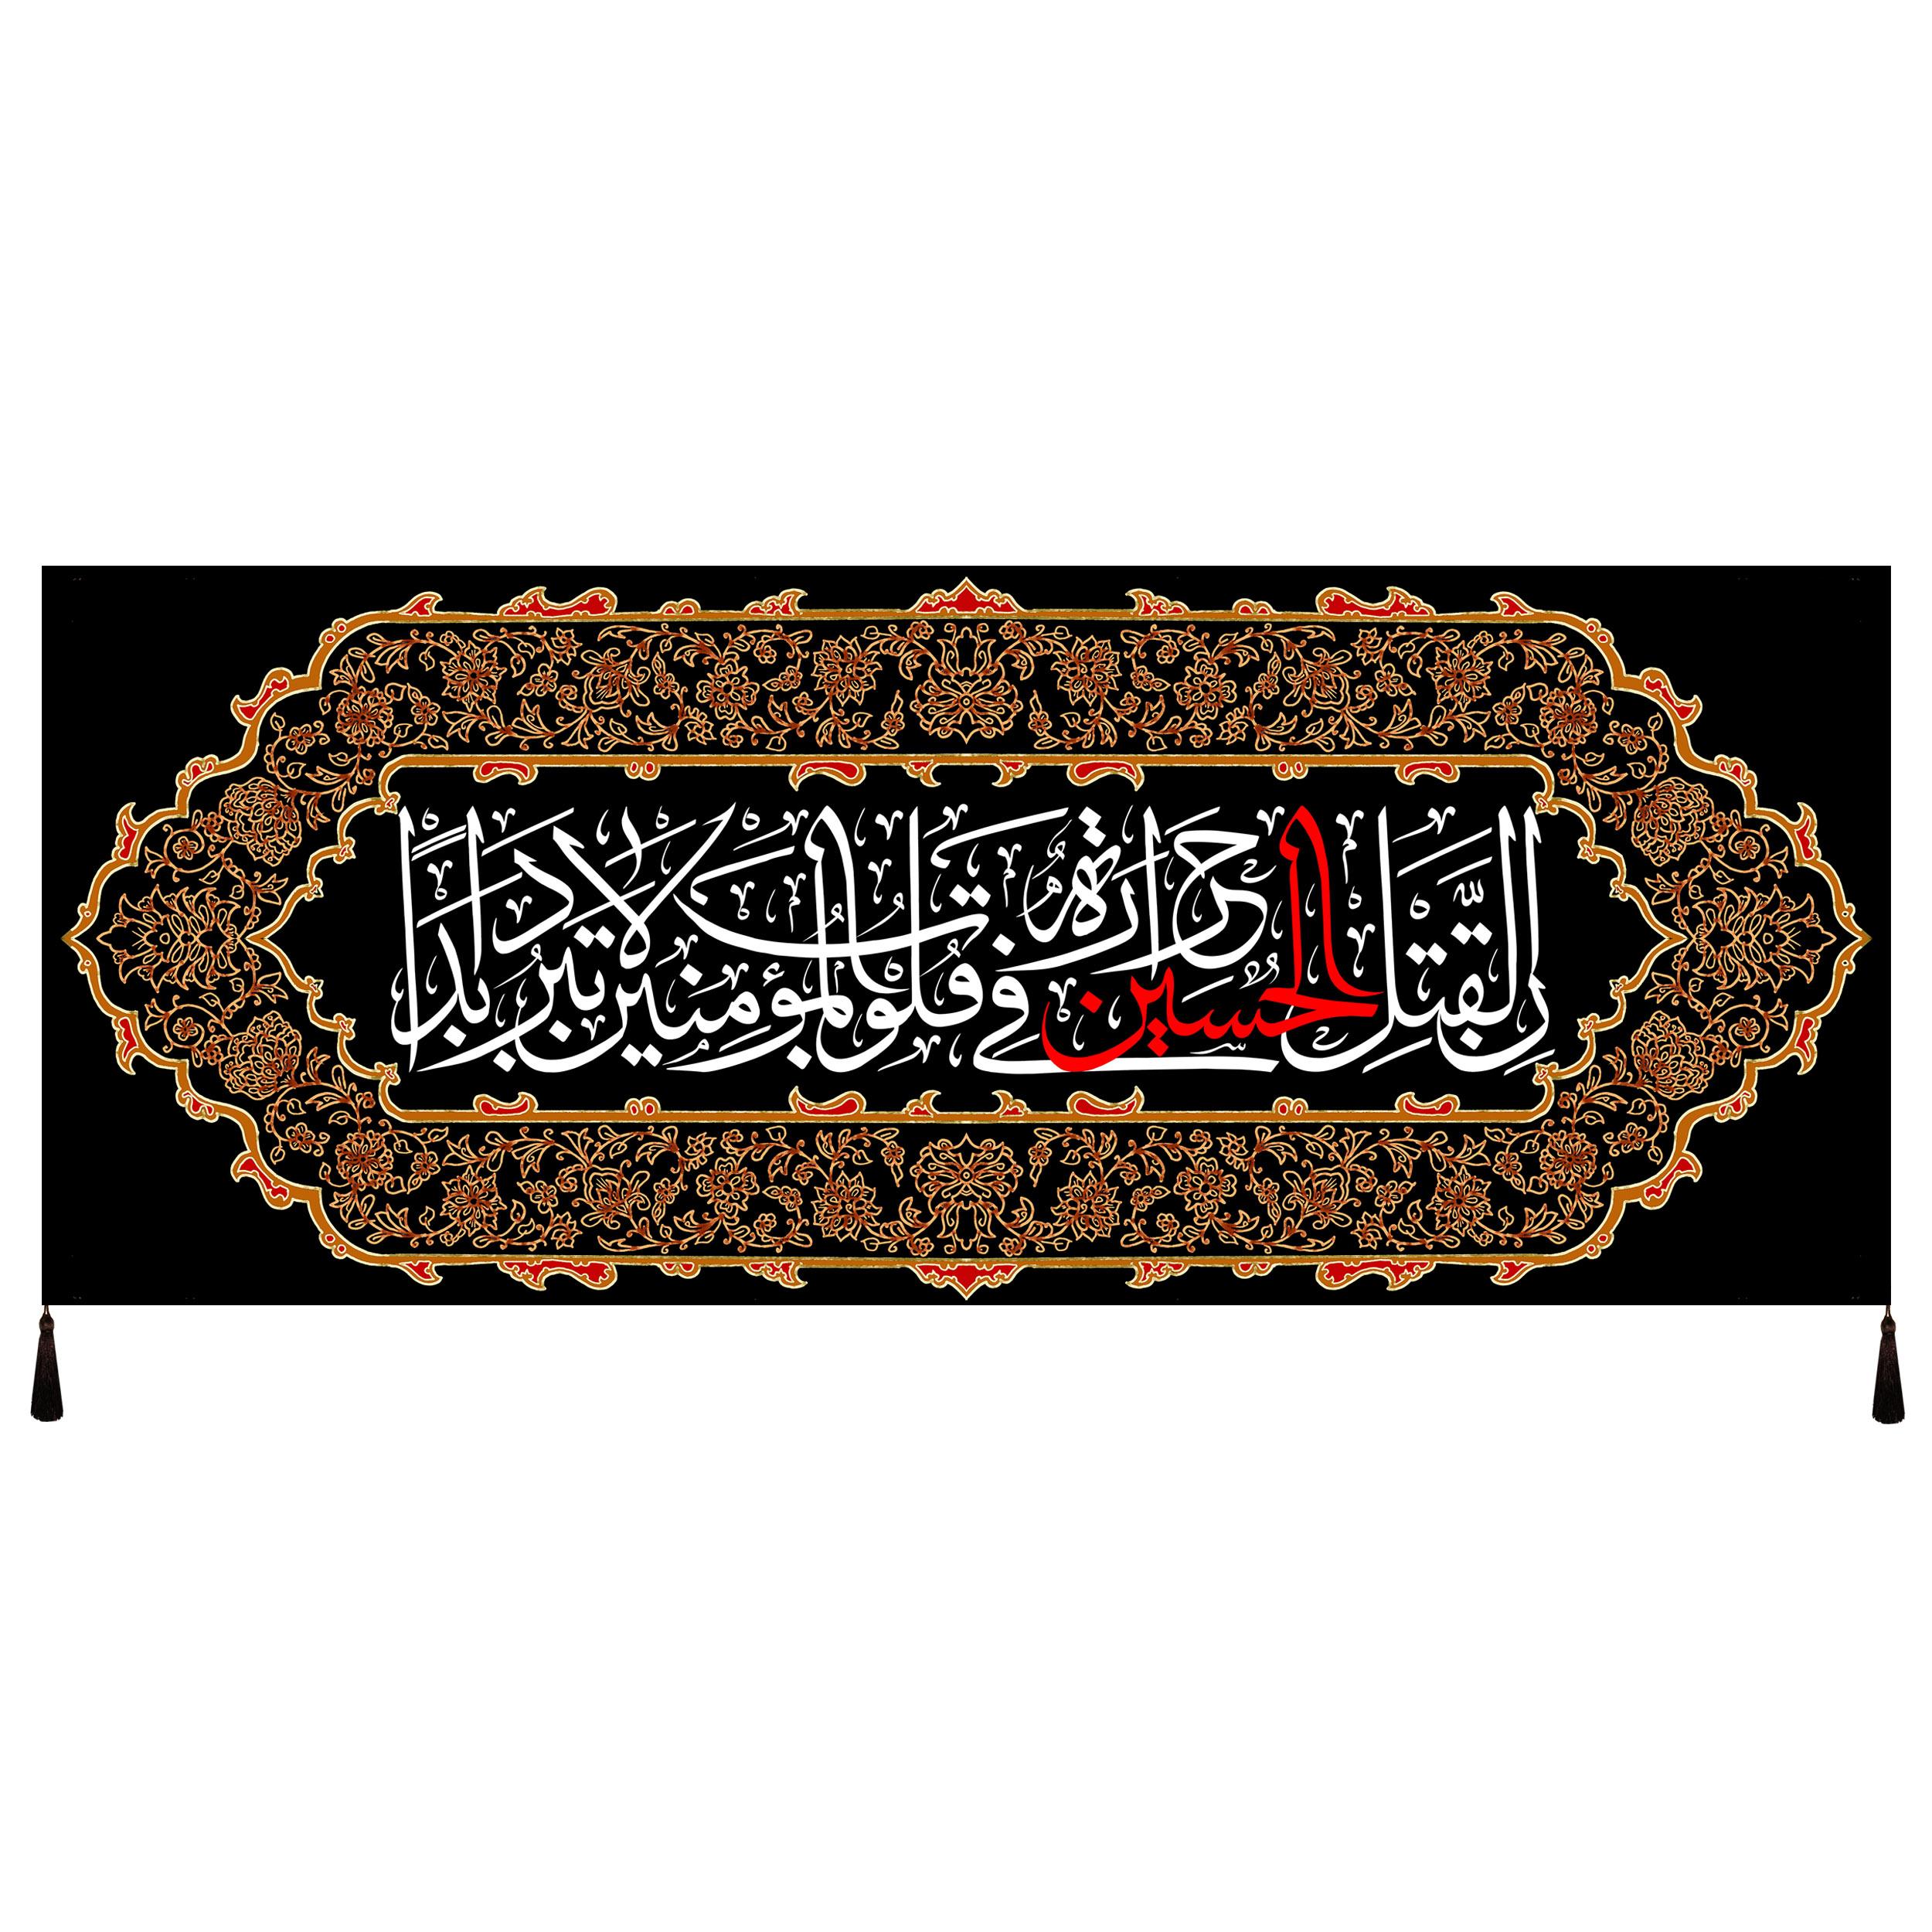 پرچم طرح امام حسین علیه السلام کد 1090